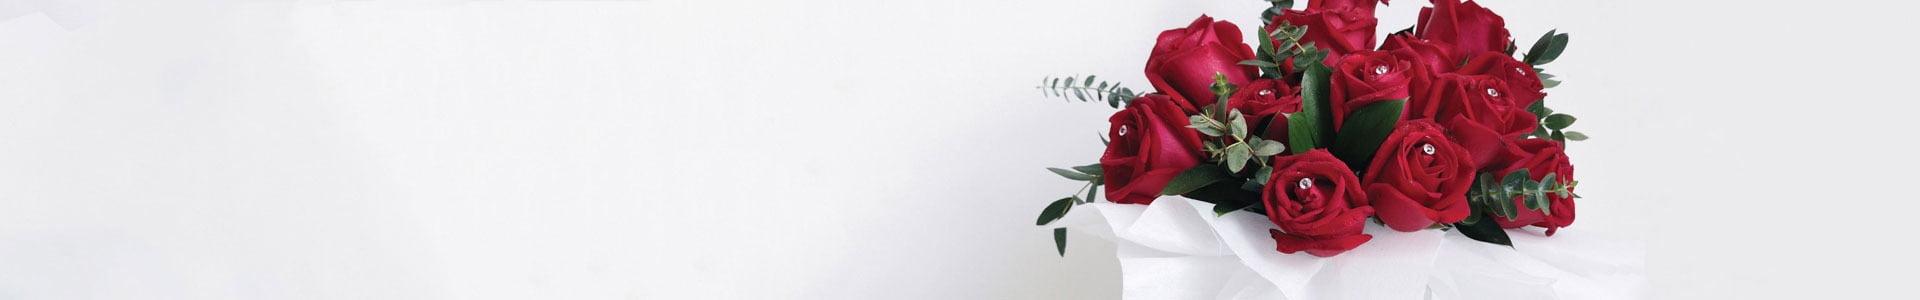 Flower-Box-Page-Header-v2